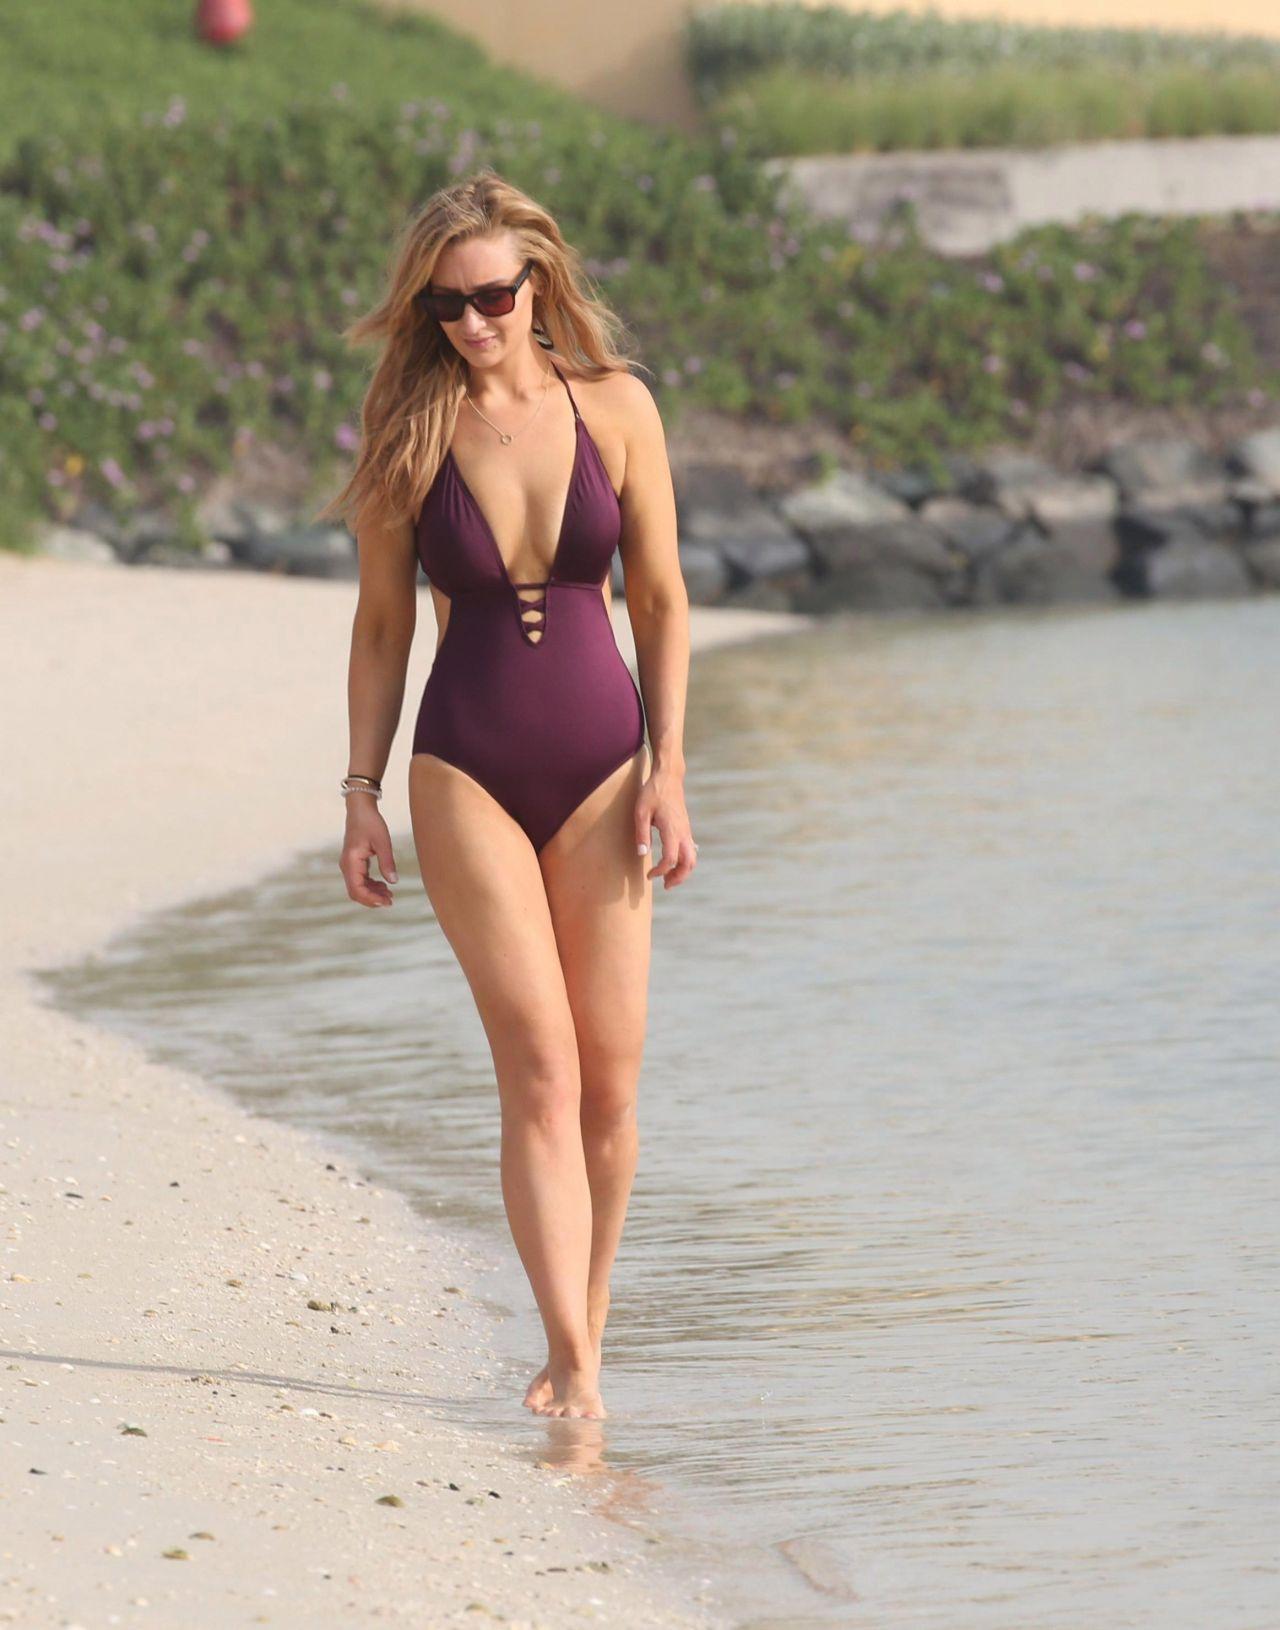 Bikini Catherine Tyldesley naked (36 photos), Cleavage